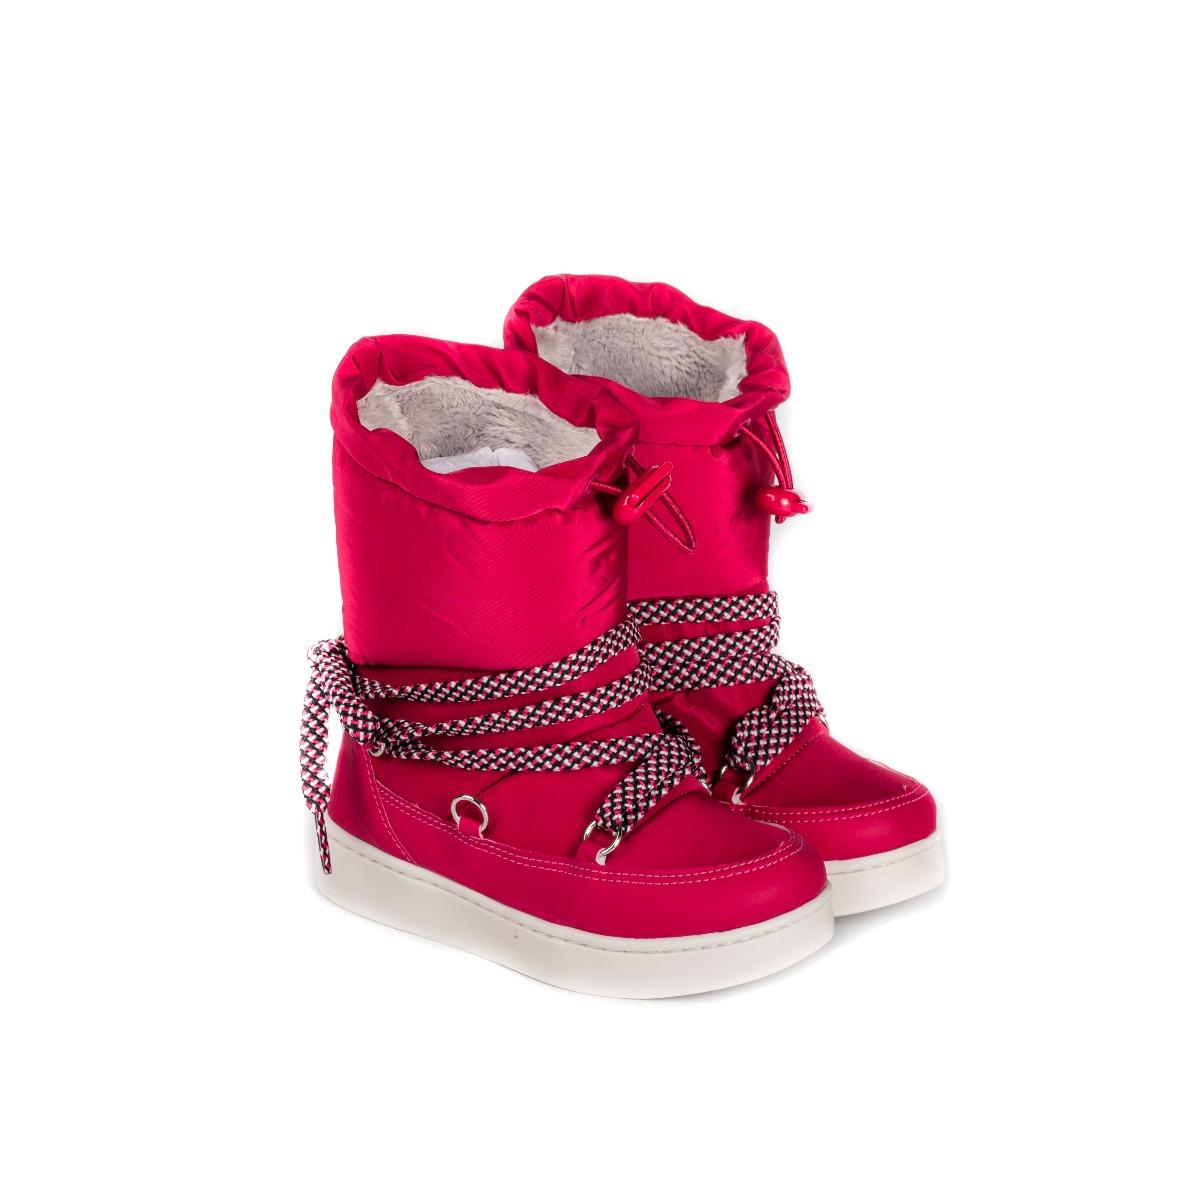 Cizme fete Bibi Urban Urban Boots Rodie cu blanita